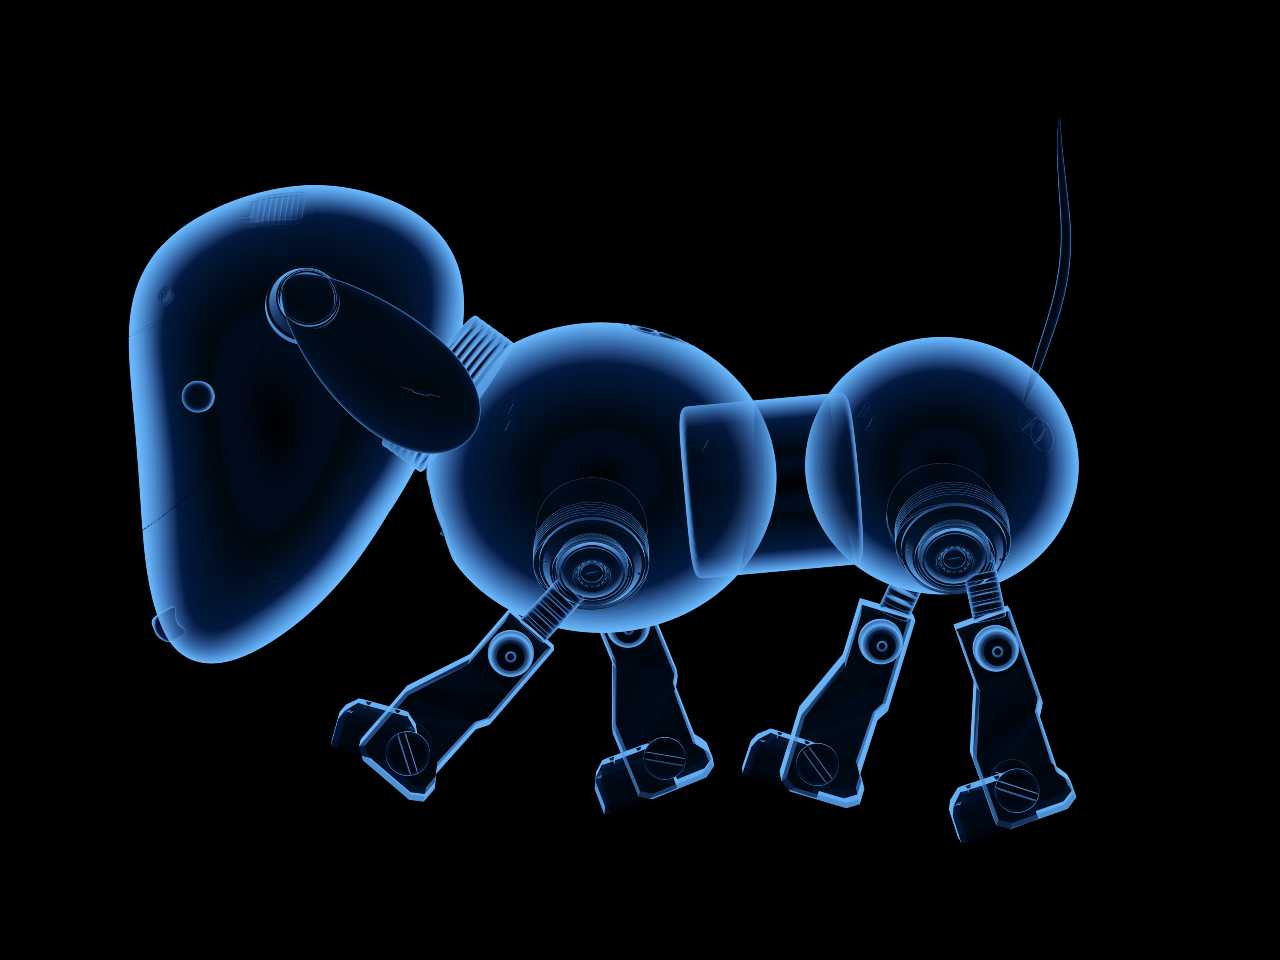 Cyber Dog (Adobe Stock)